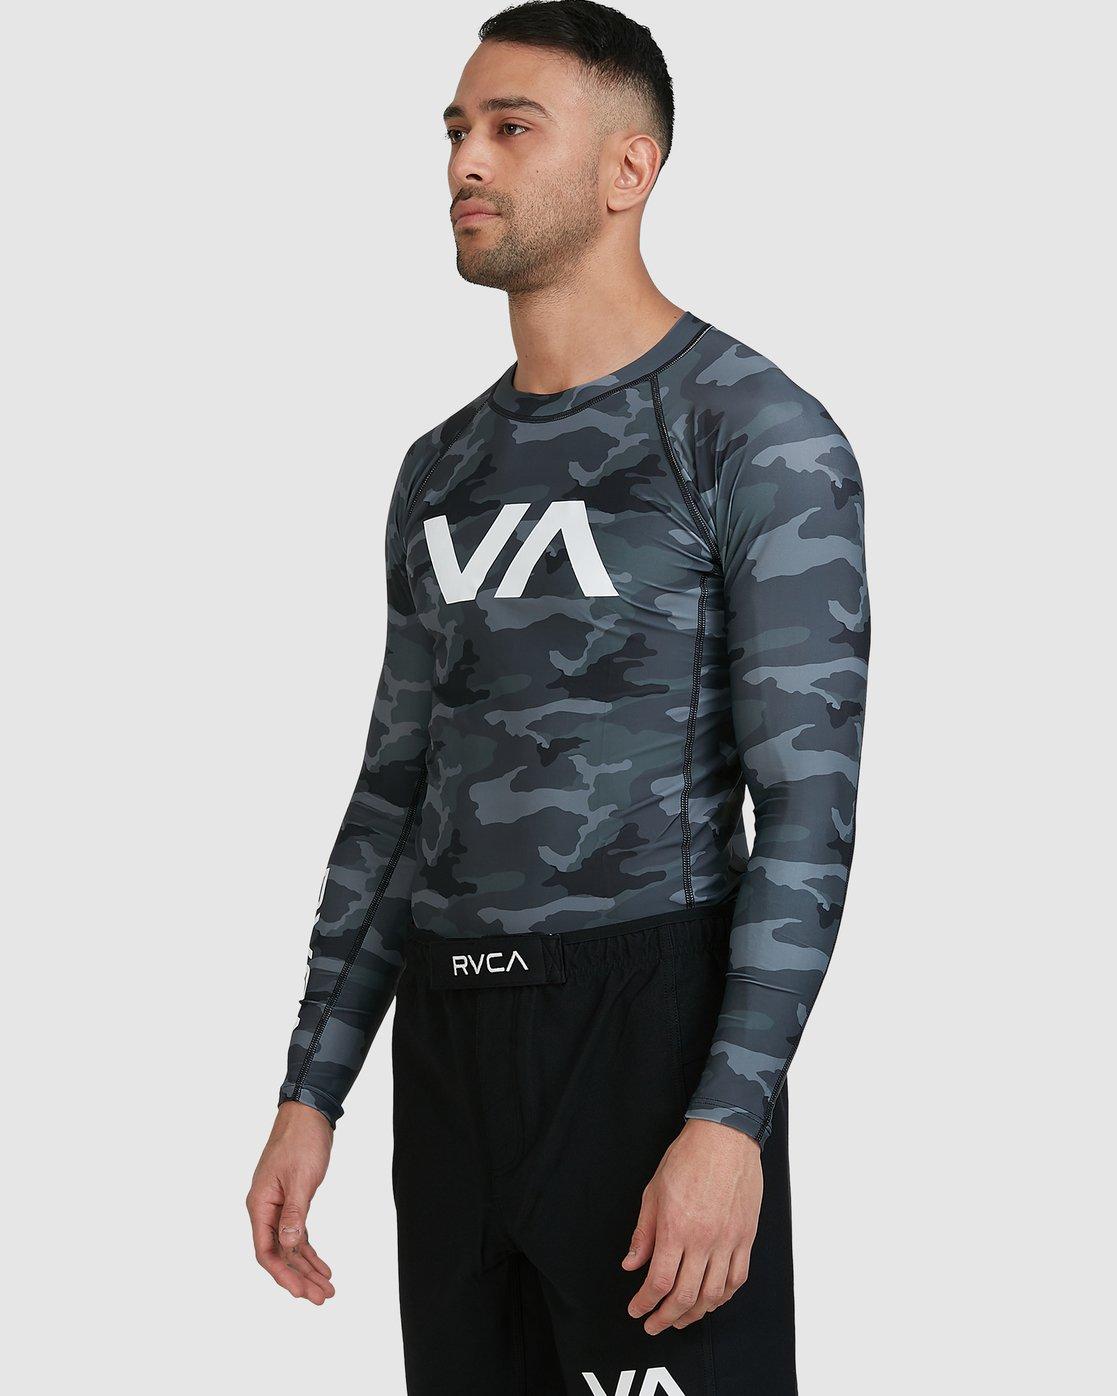 6 Sport Long Sleeve Rashguard Camo R381661 RVCA